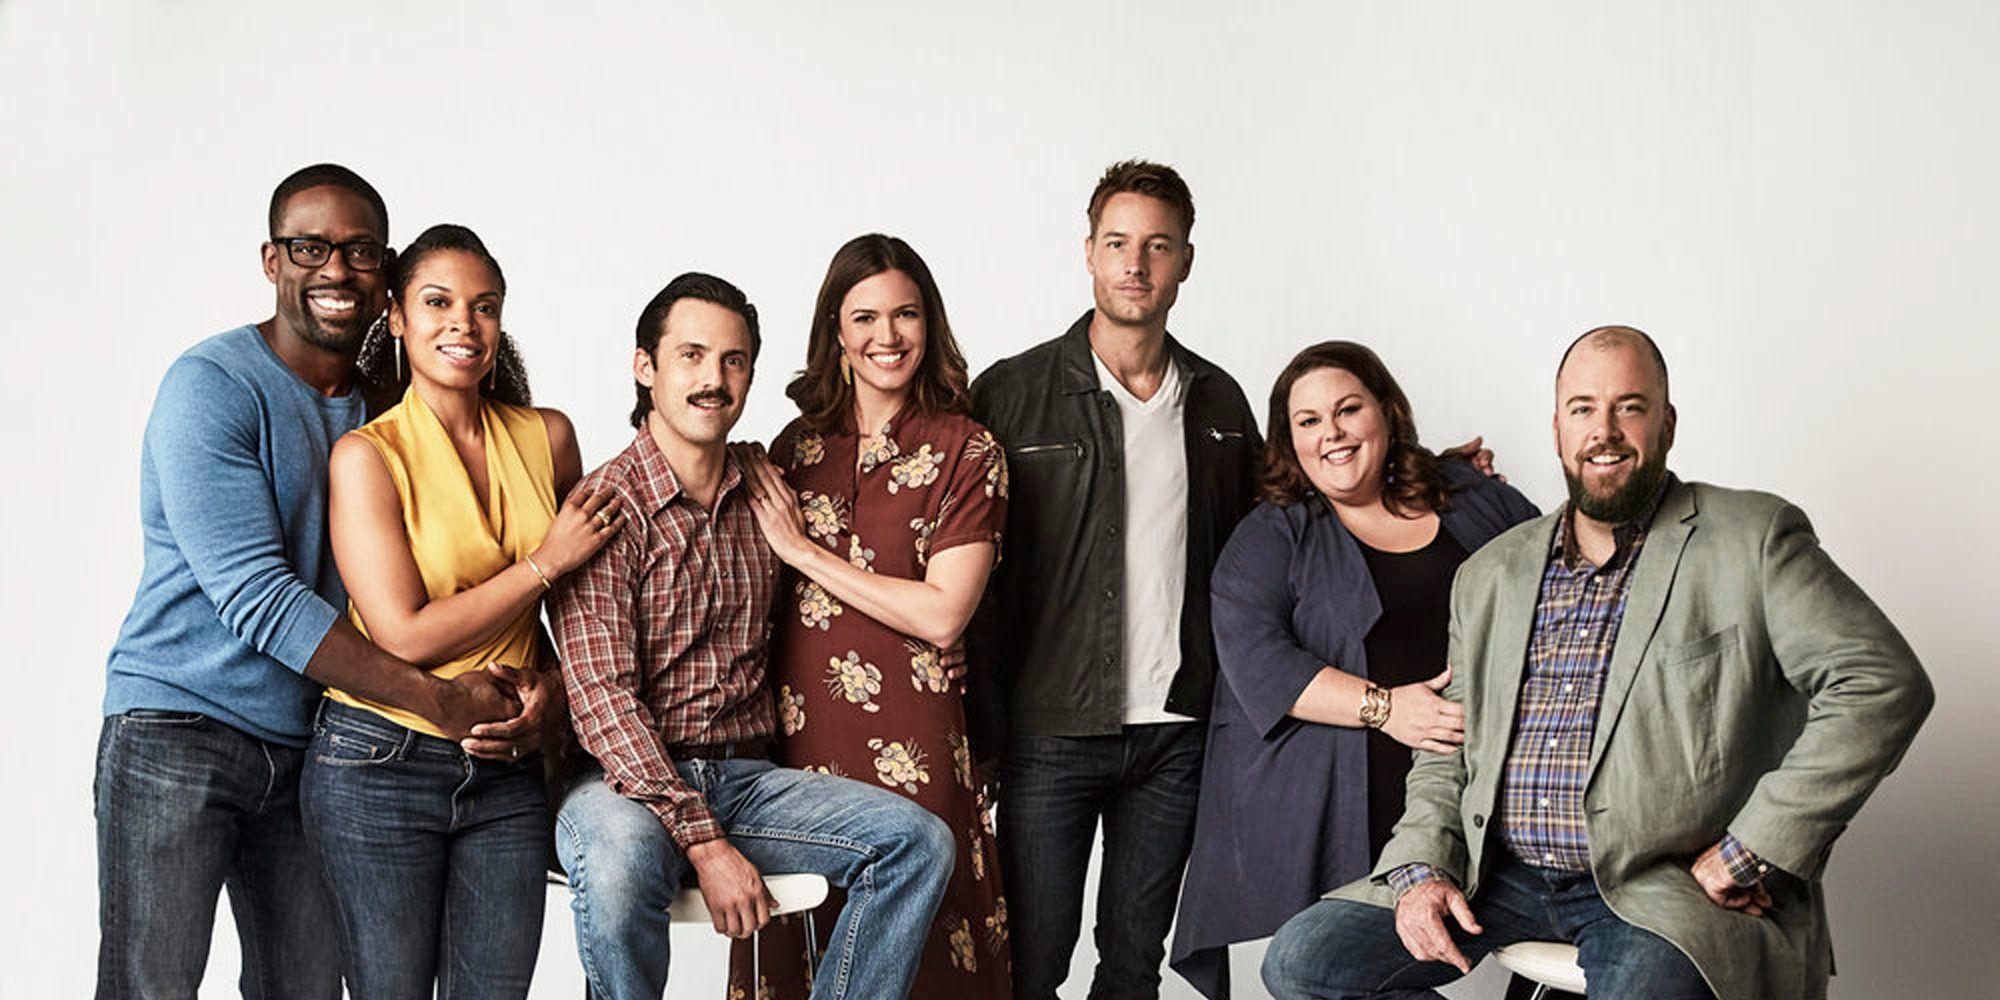 Sterling K Brown, Susan Kelechi Watson, Milo Ventimiglia, Mandy Moore, Justin Hartley, Chrissy Metz, Chris Sullivan, This is Us, Season 2